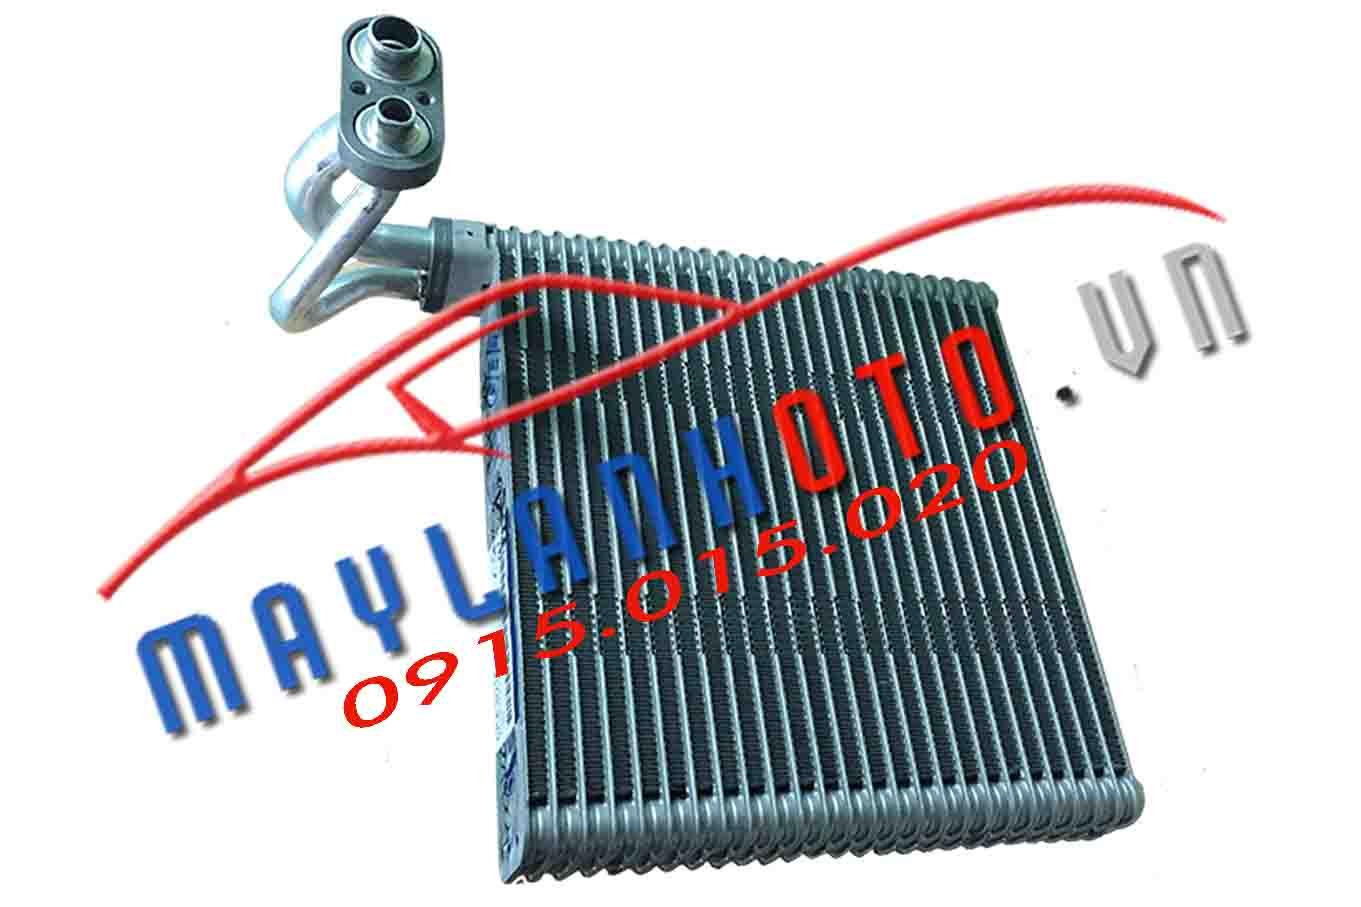 Daewoo Matiz 4 / Dàn lạnh Daewoo Matiz 4 / Giàn lạnh Daewoo Matiz 4